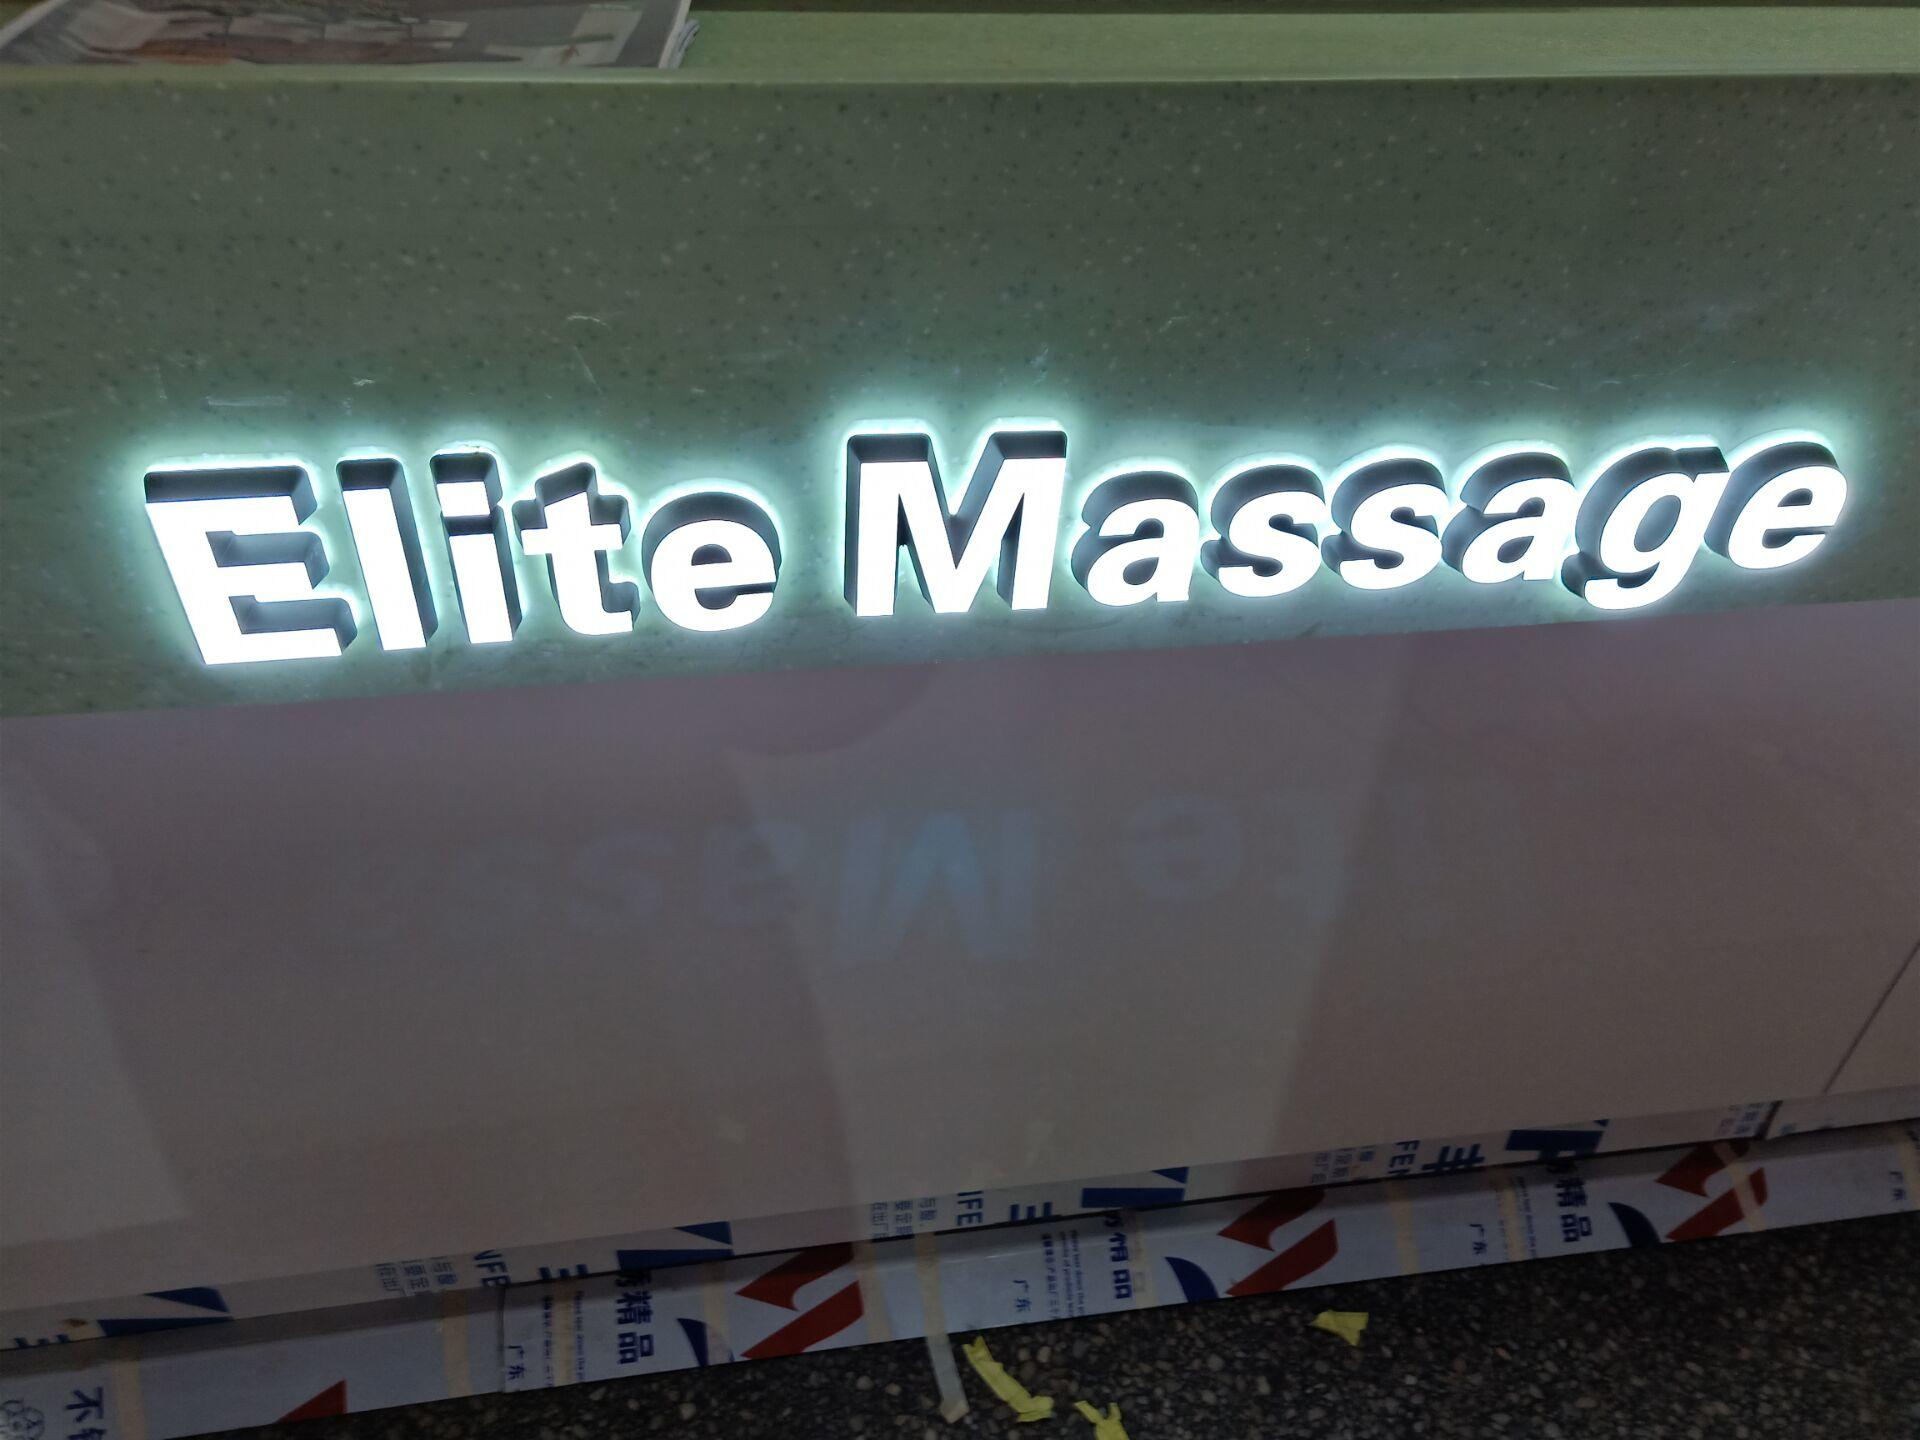 massage kiosk